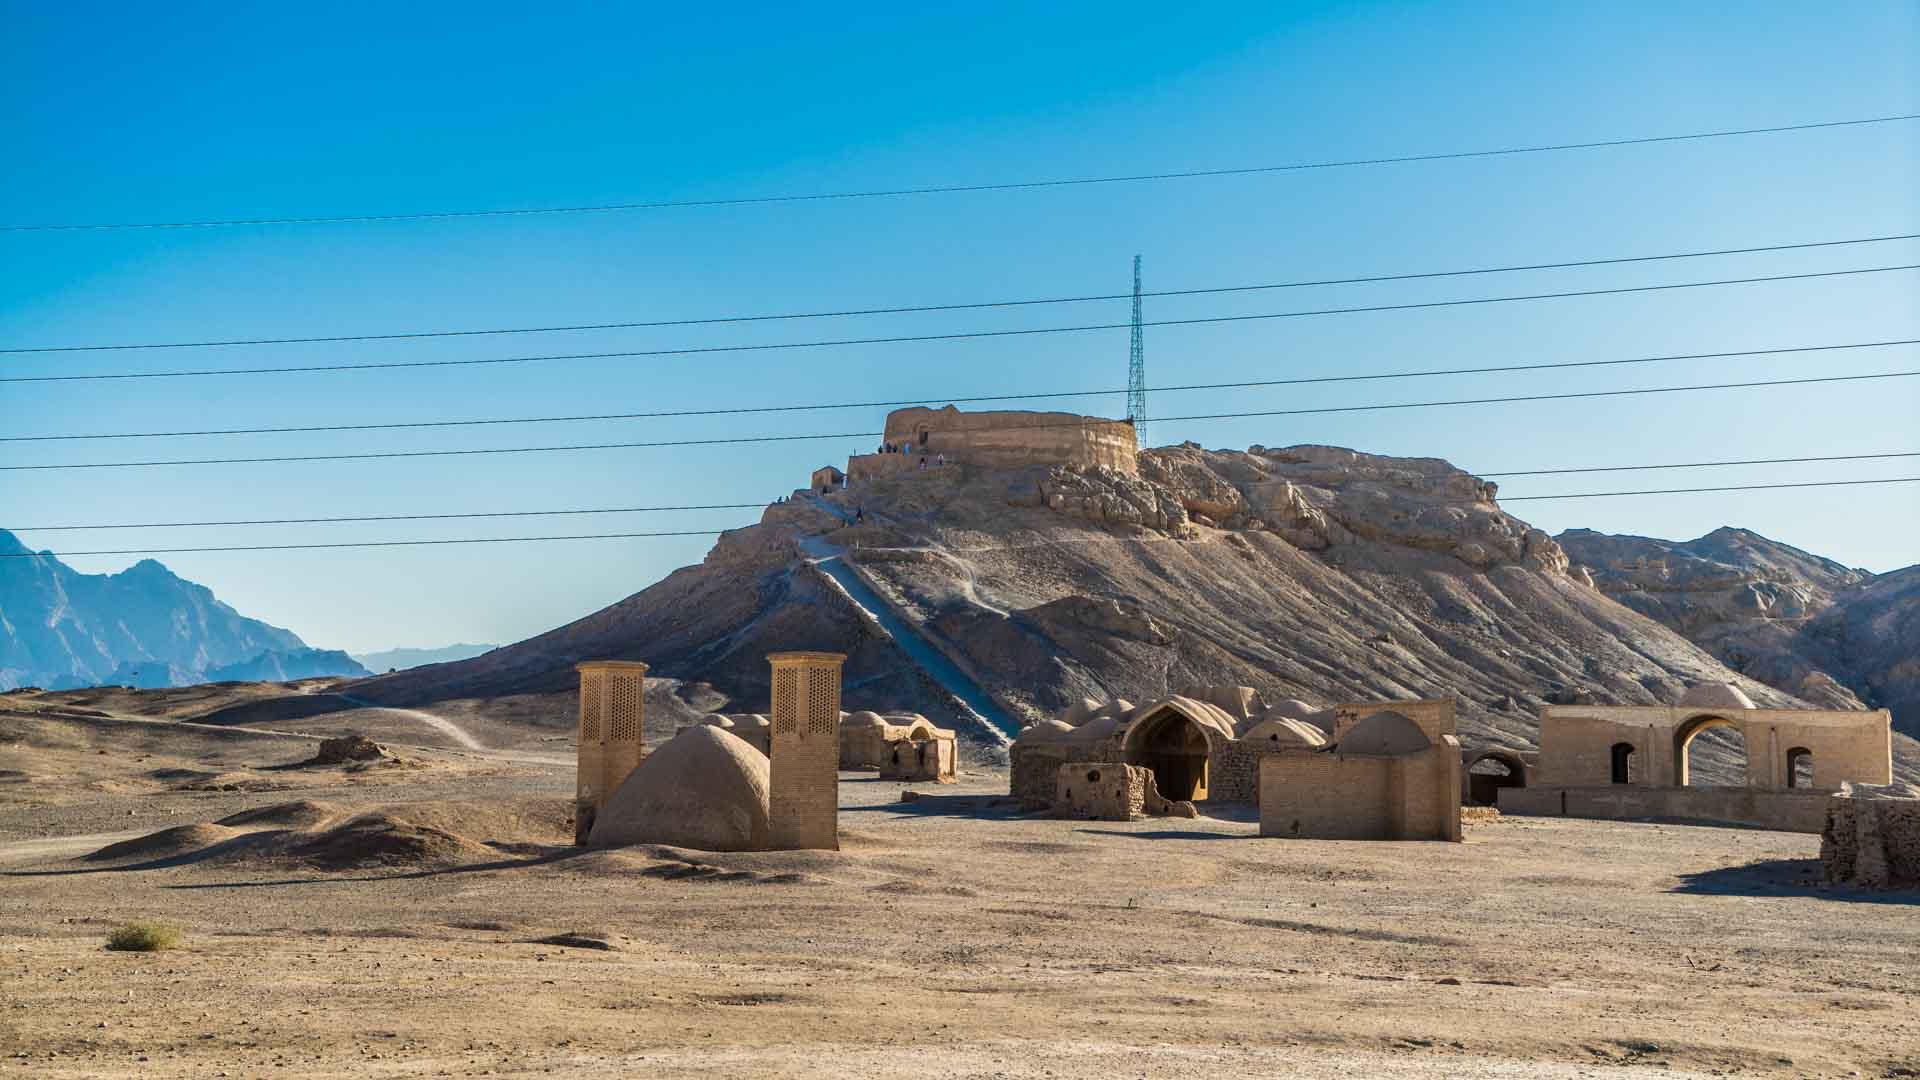 Yazd Zoroastrian Towers of Silence 3